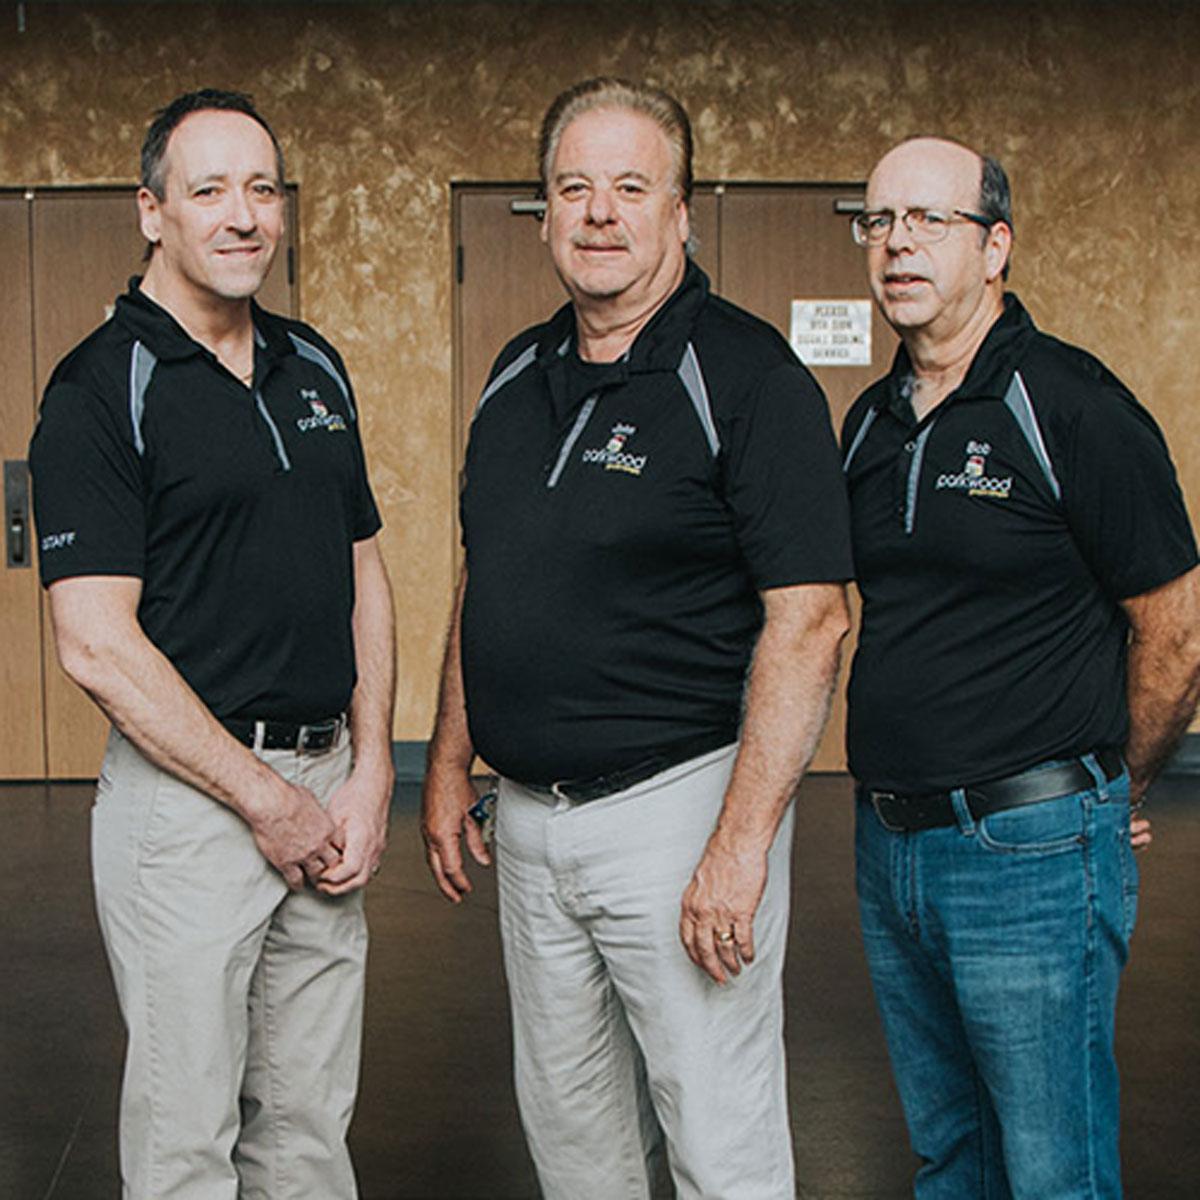 Maintenance Staff - John Egeto | Bob WrightPat Callery | Nabila Jamal519-948-7055 Ext 244maint@parkwoodwindsor.com